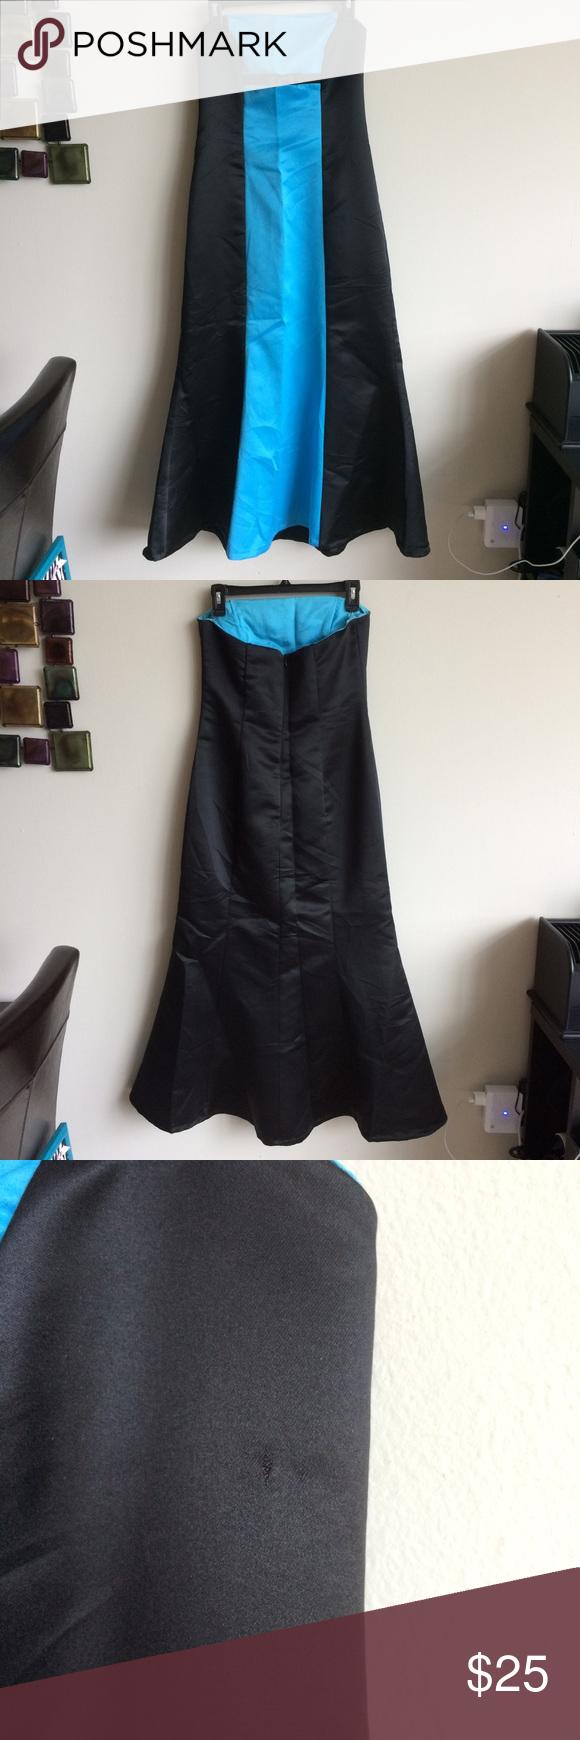 Blue and black formal dress size